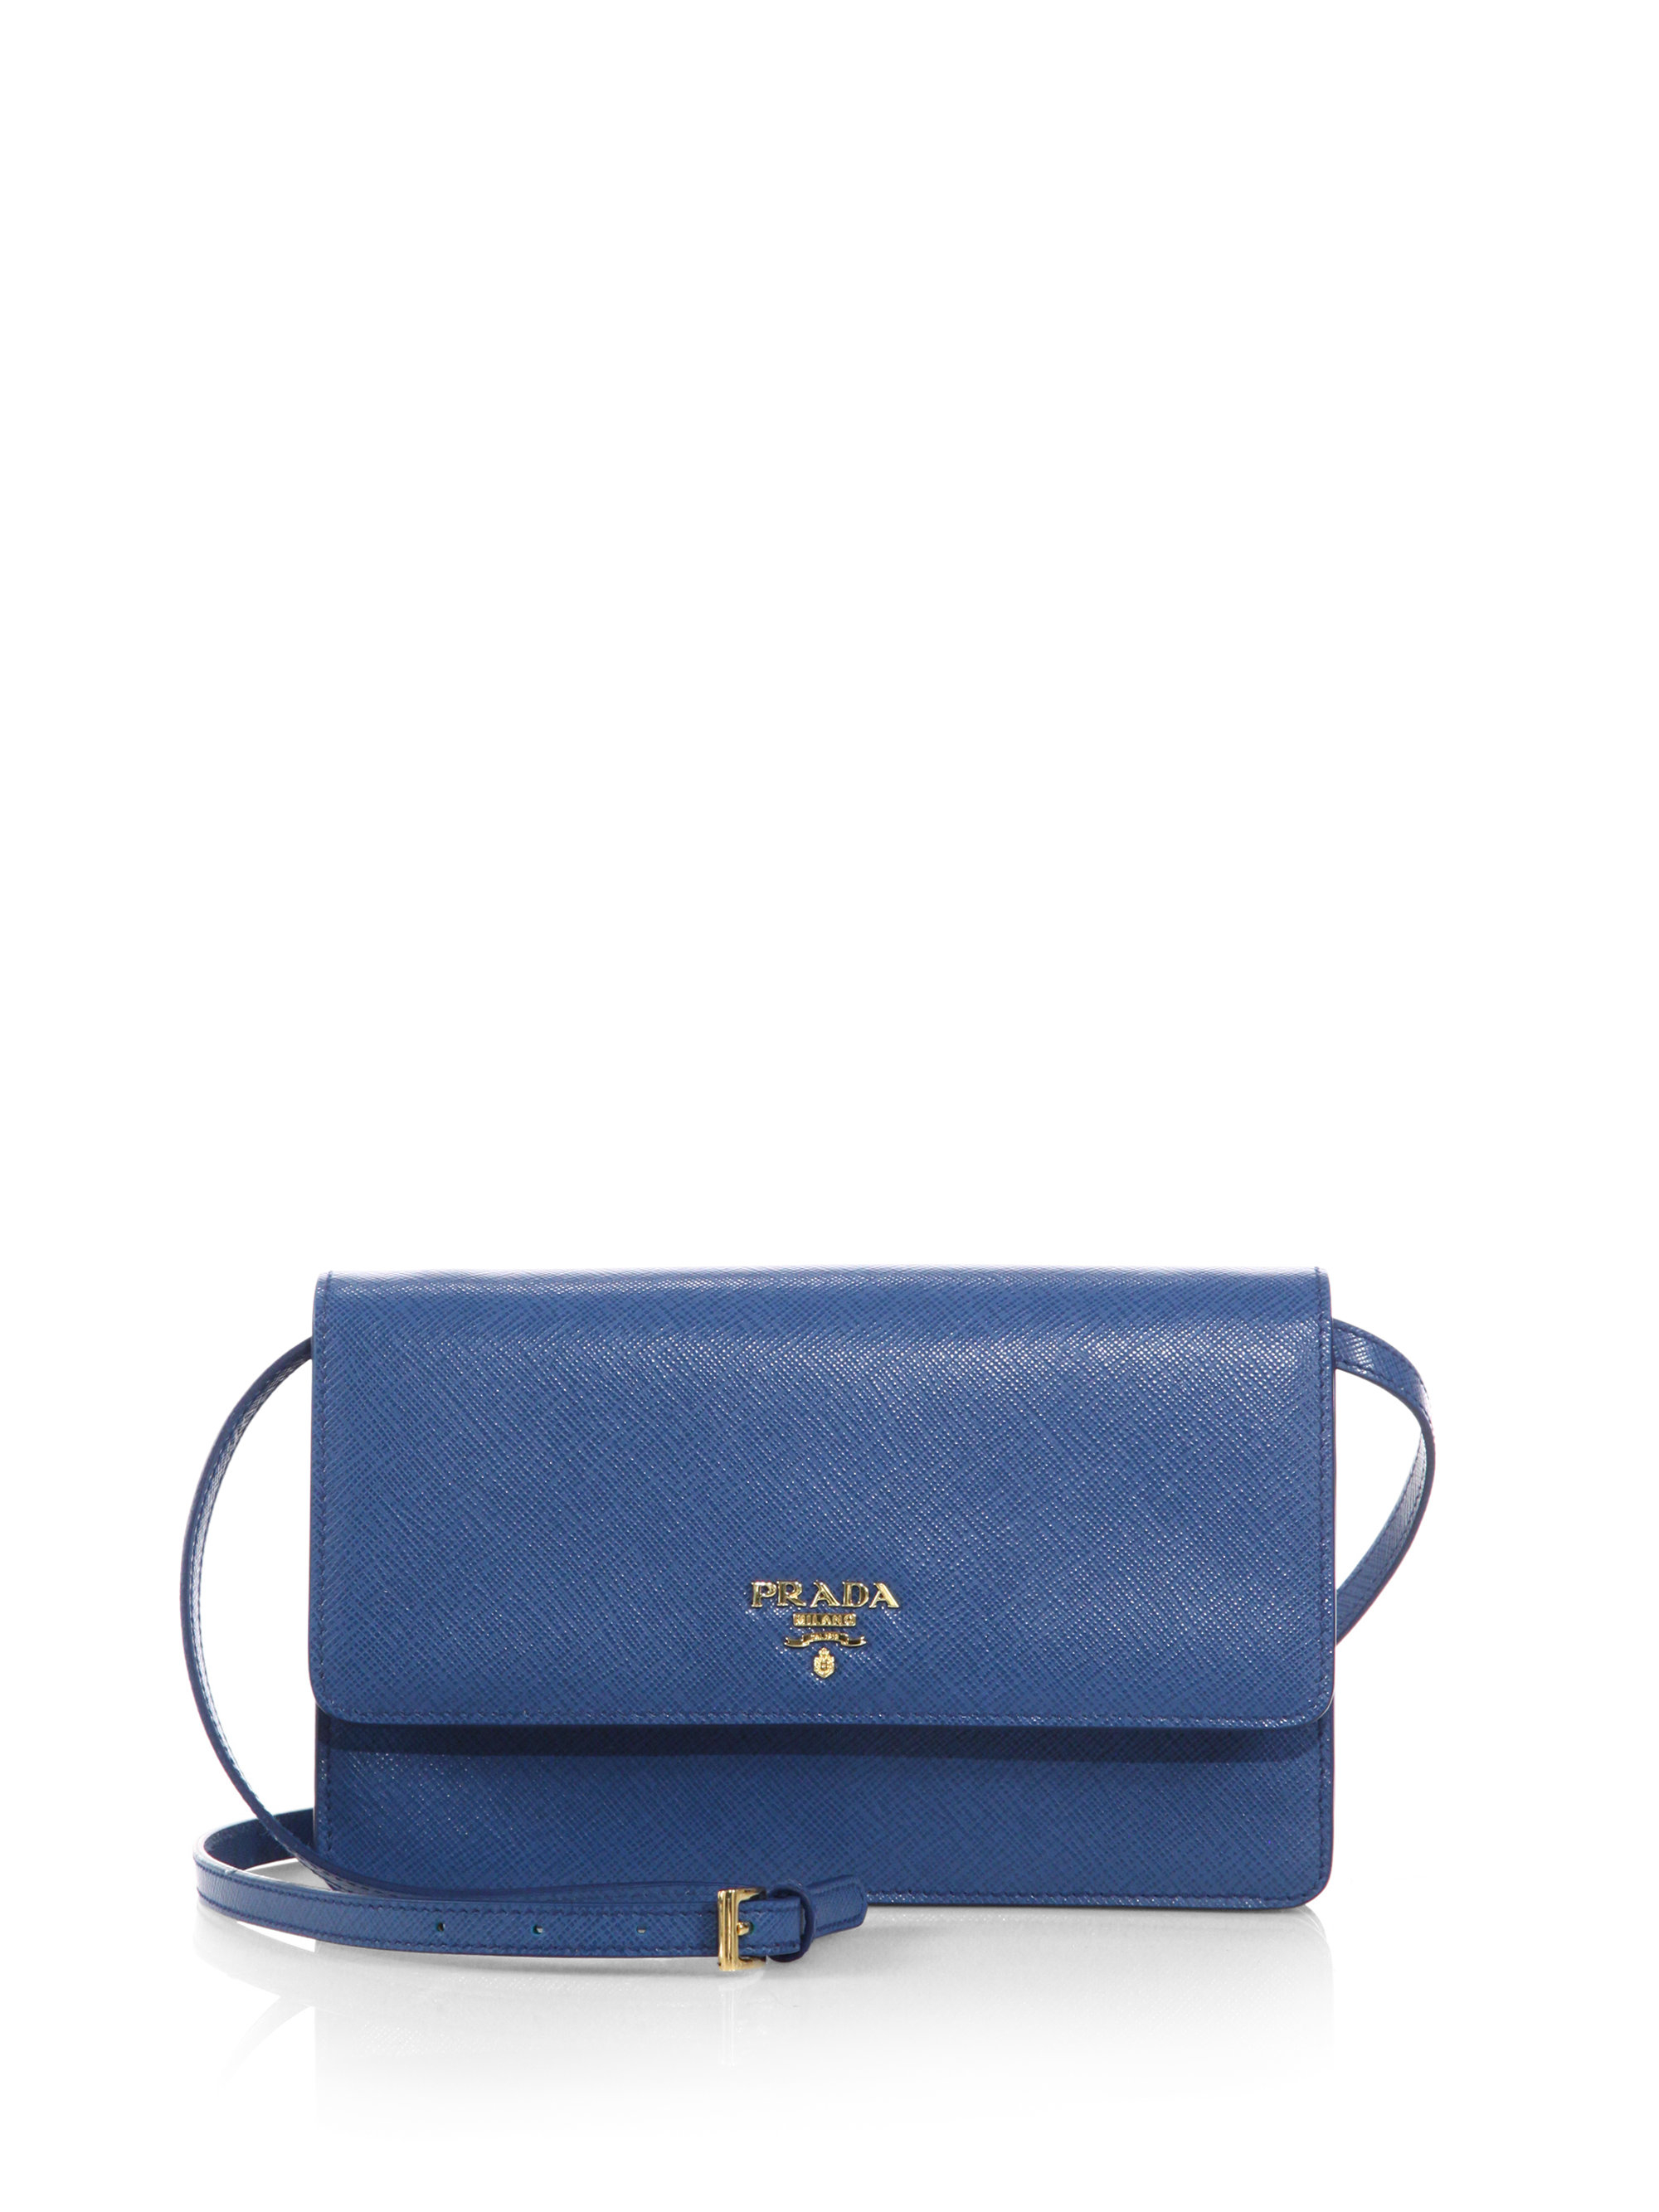 9d9cd77f6779d2 Prada Saffiano Lux Crossbody Bag in Blue - Lyst